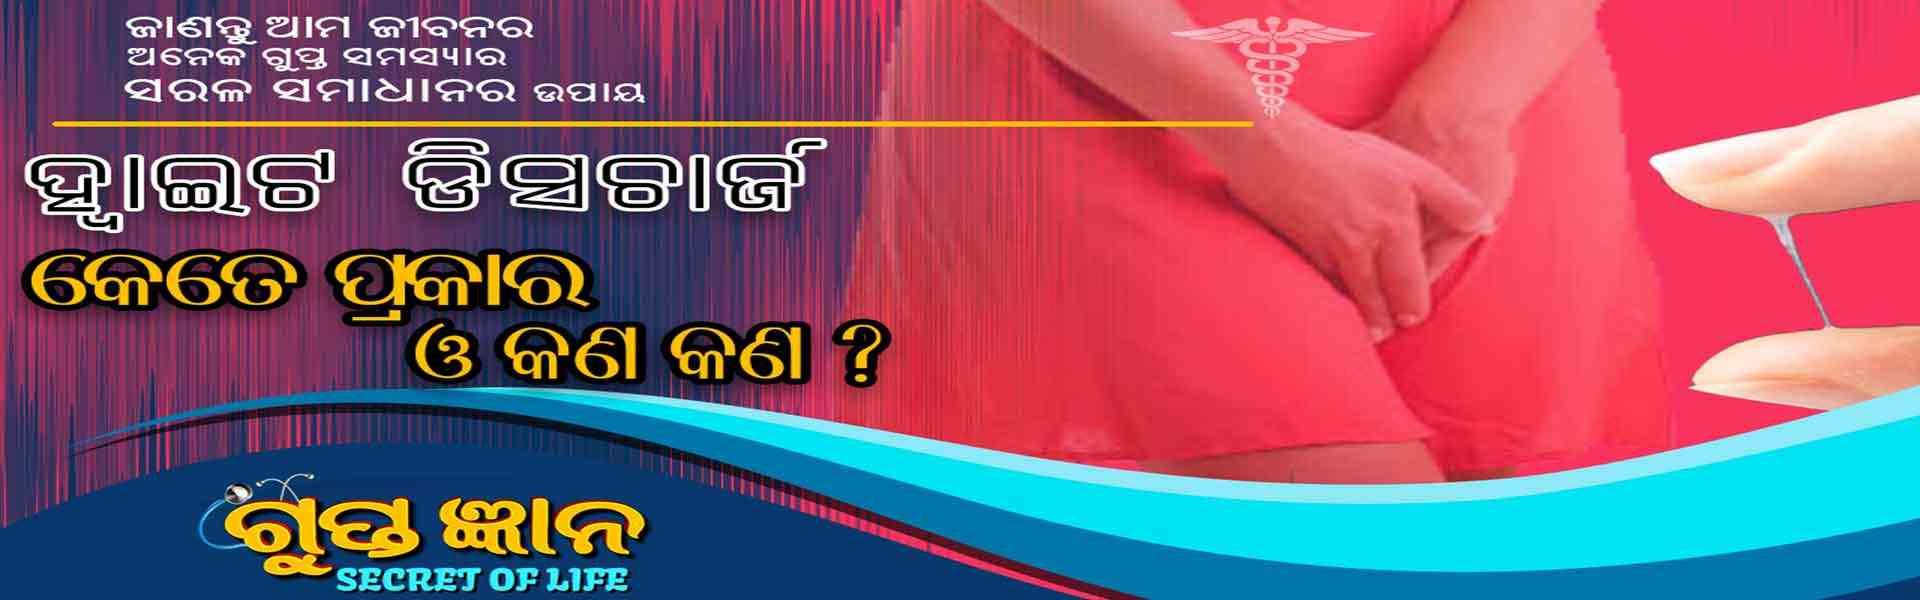 Dr Basudev Pradhan Ep   23